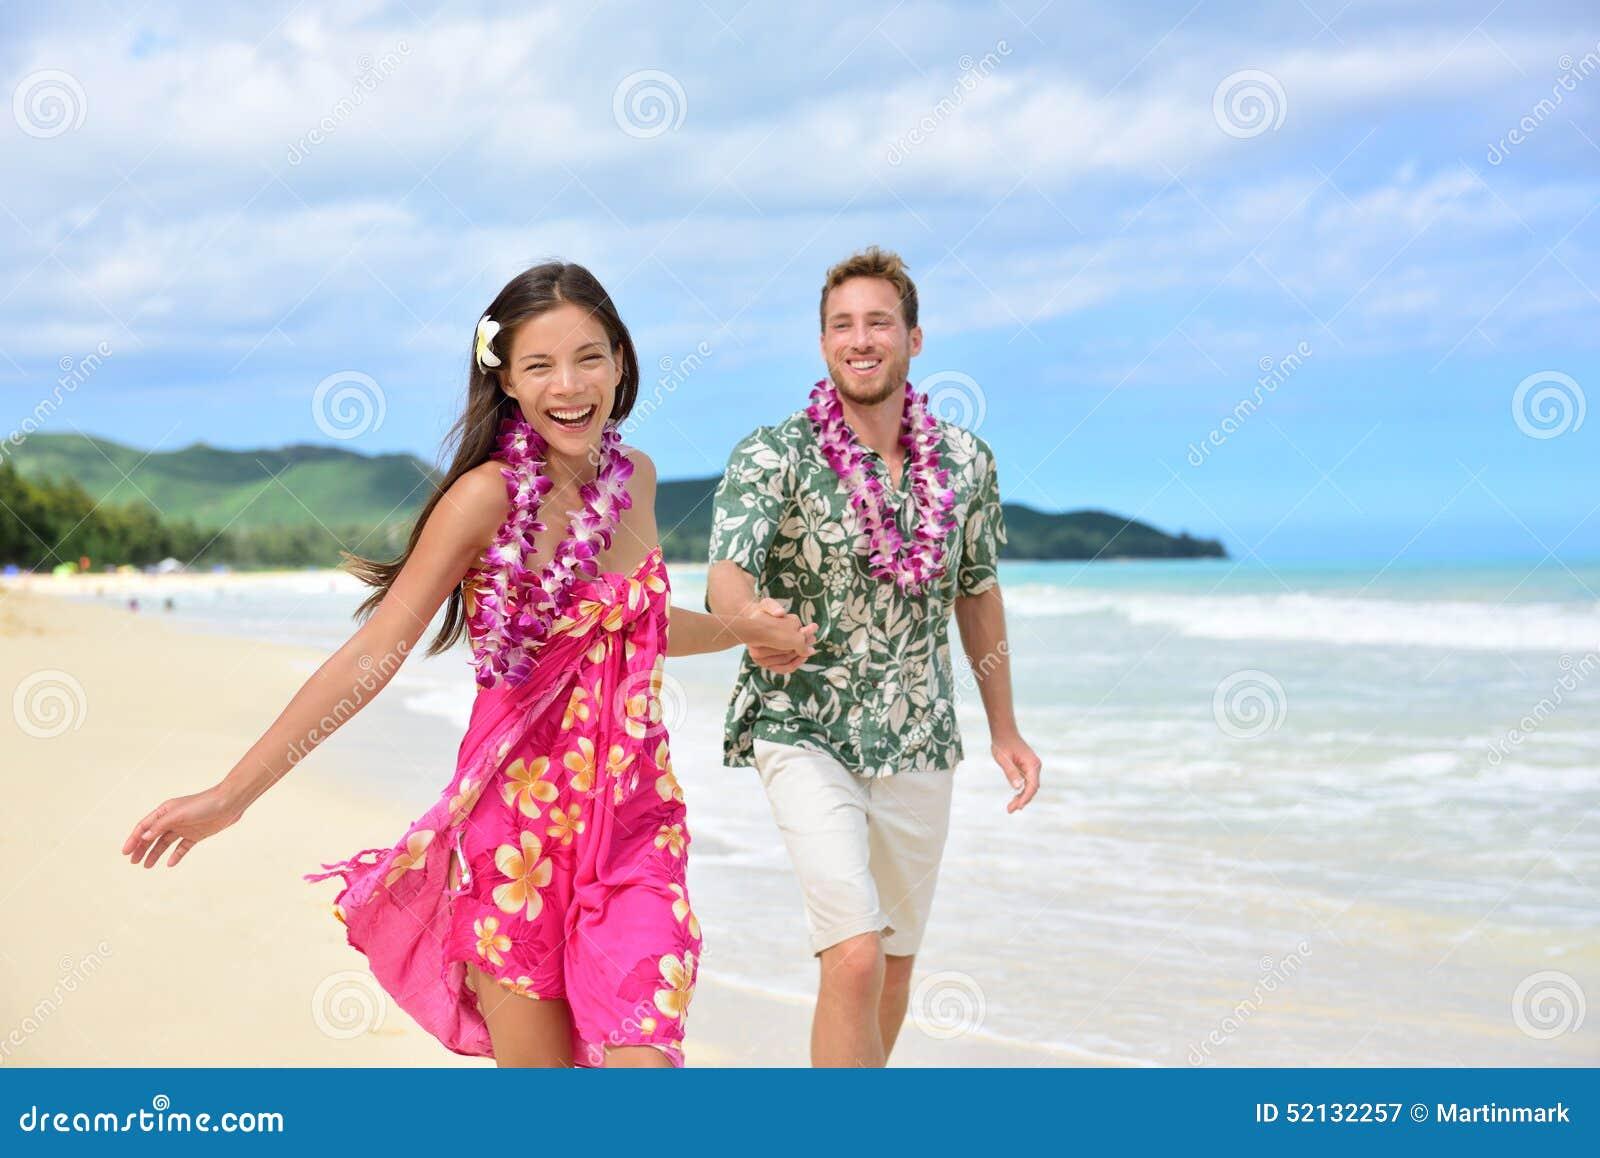 Fun Couple On Beach Vacations In Hawaiian Clothing Stock Photo